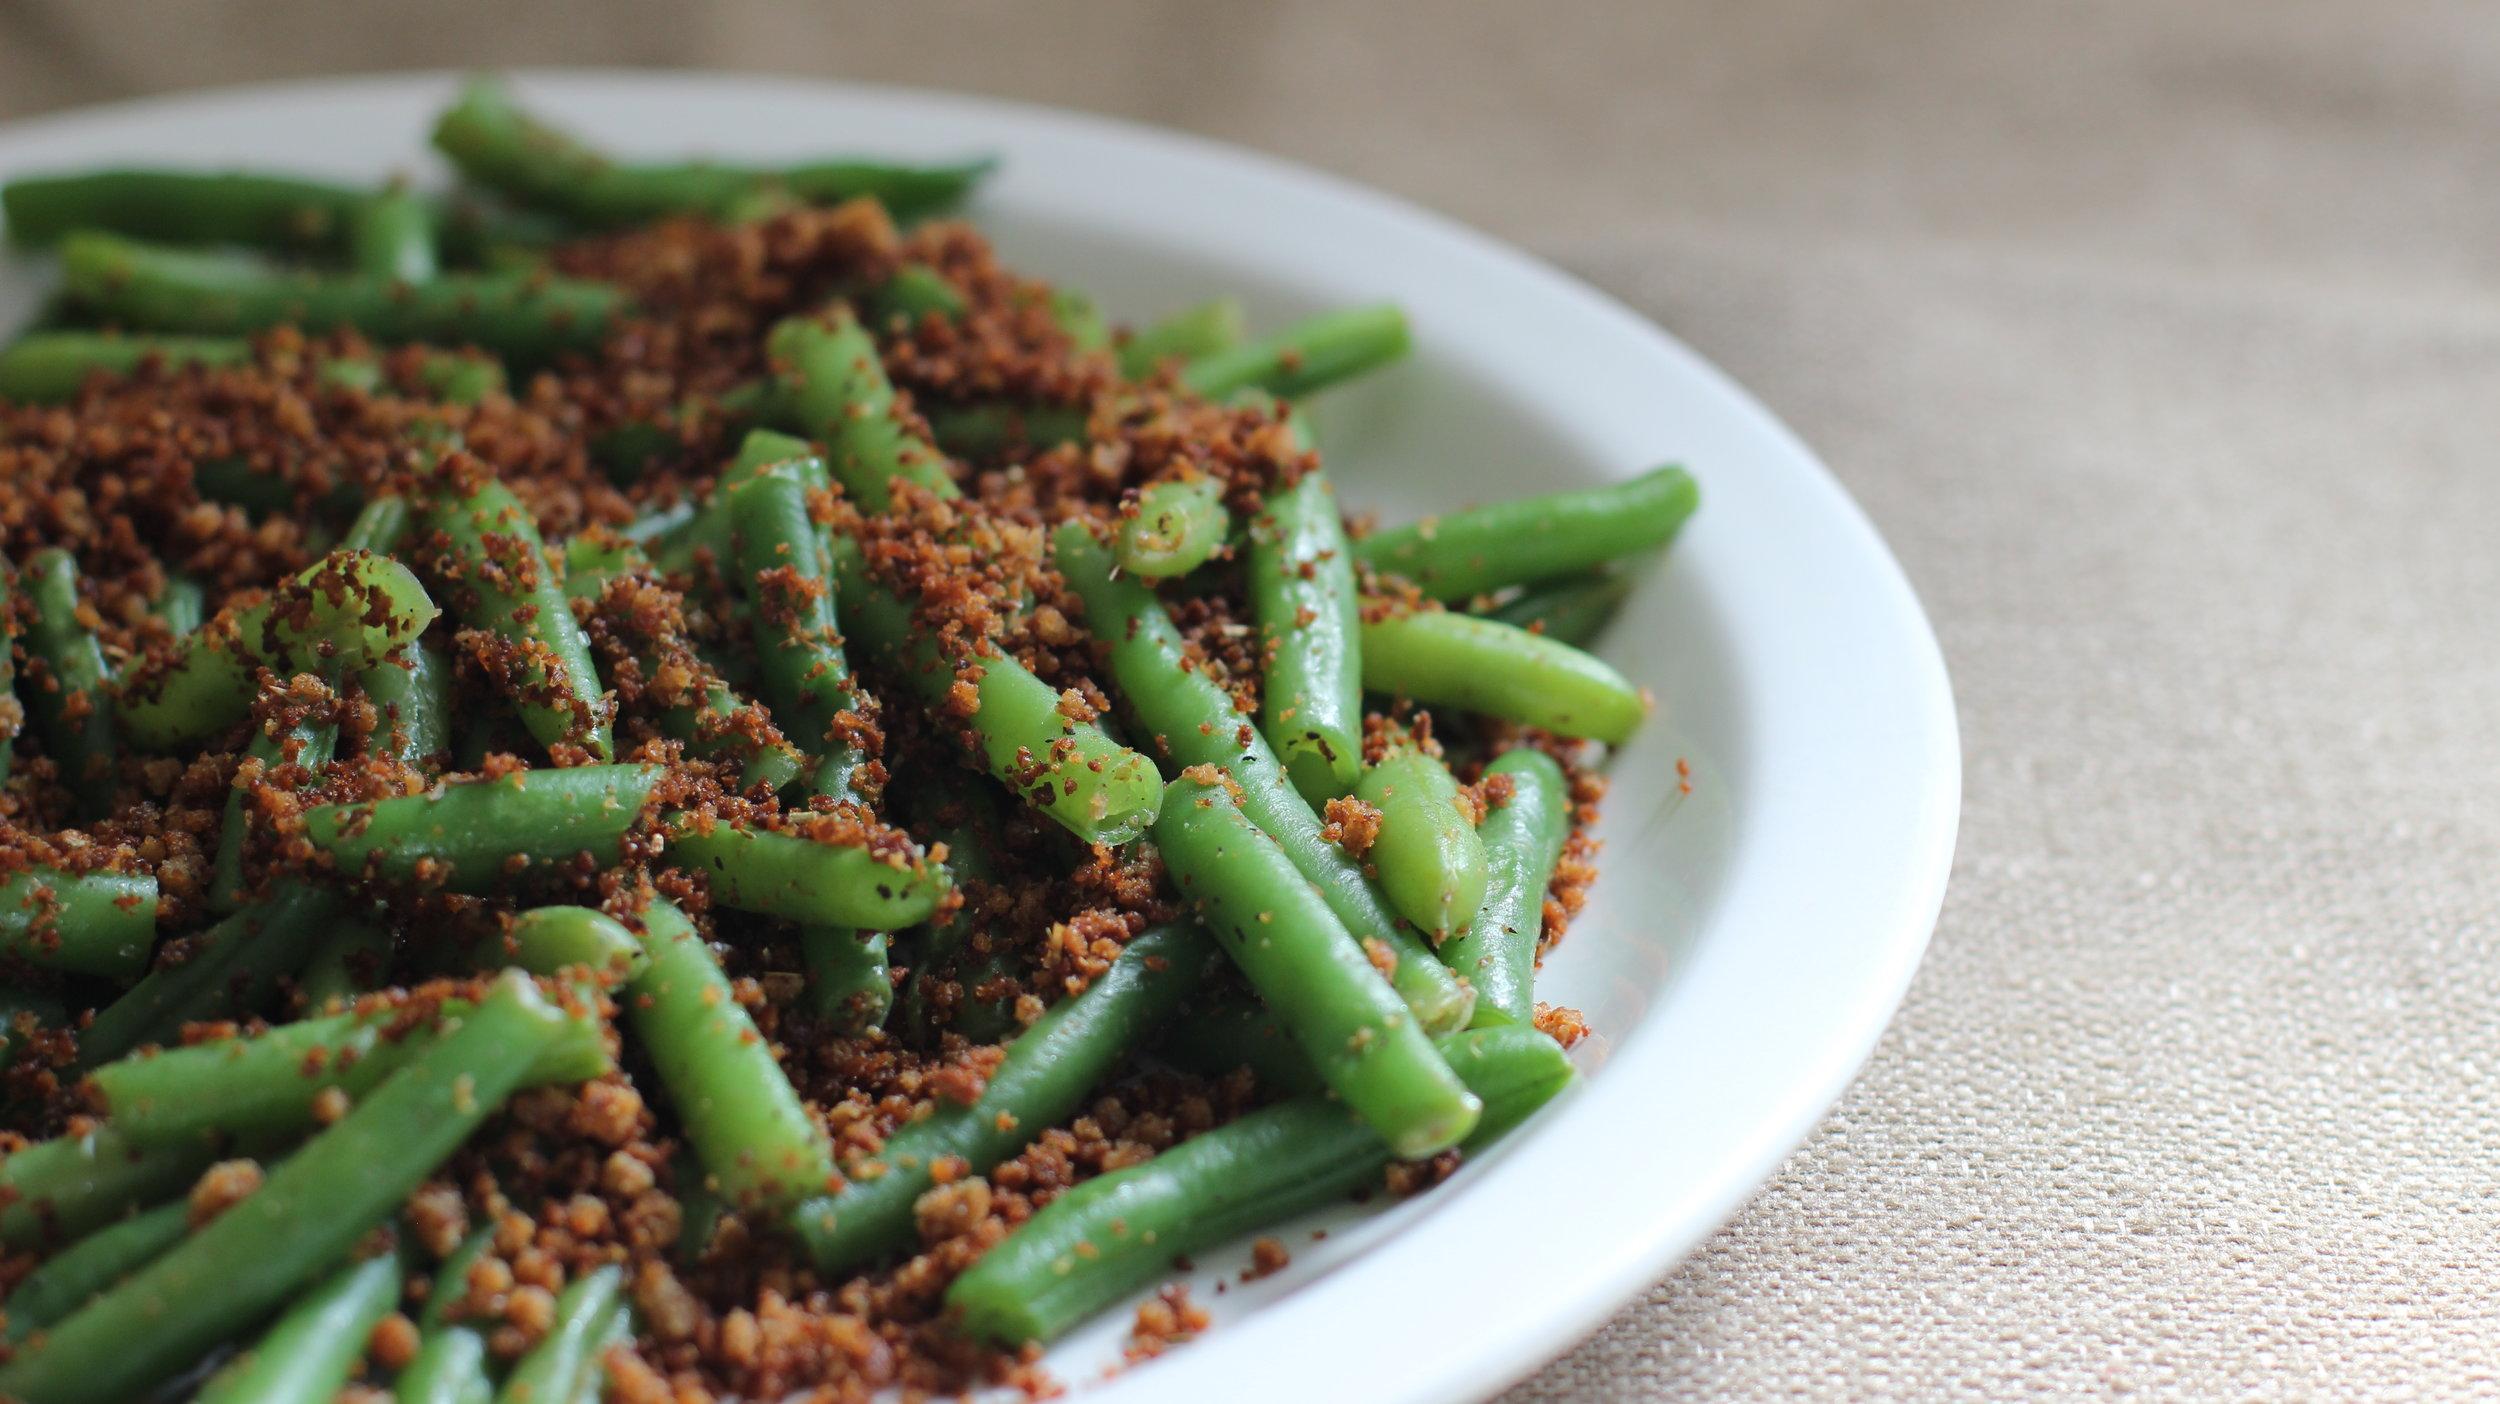 green-beans-breadcrumbs.JPG